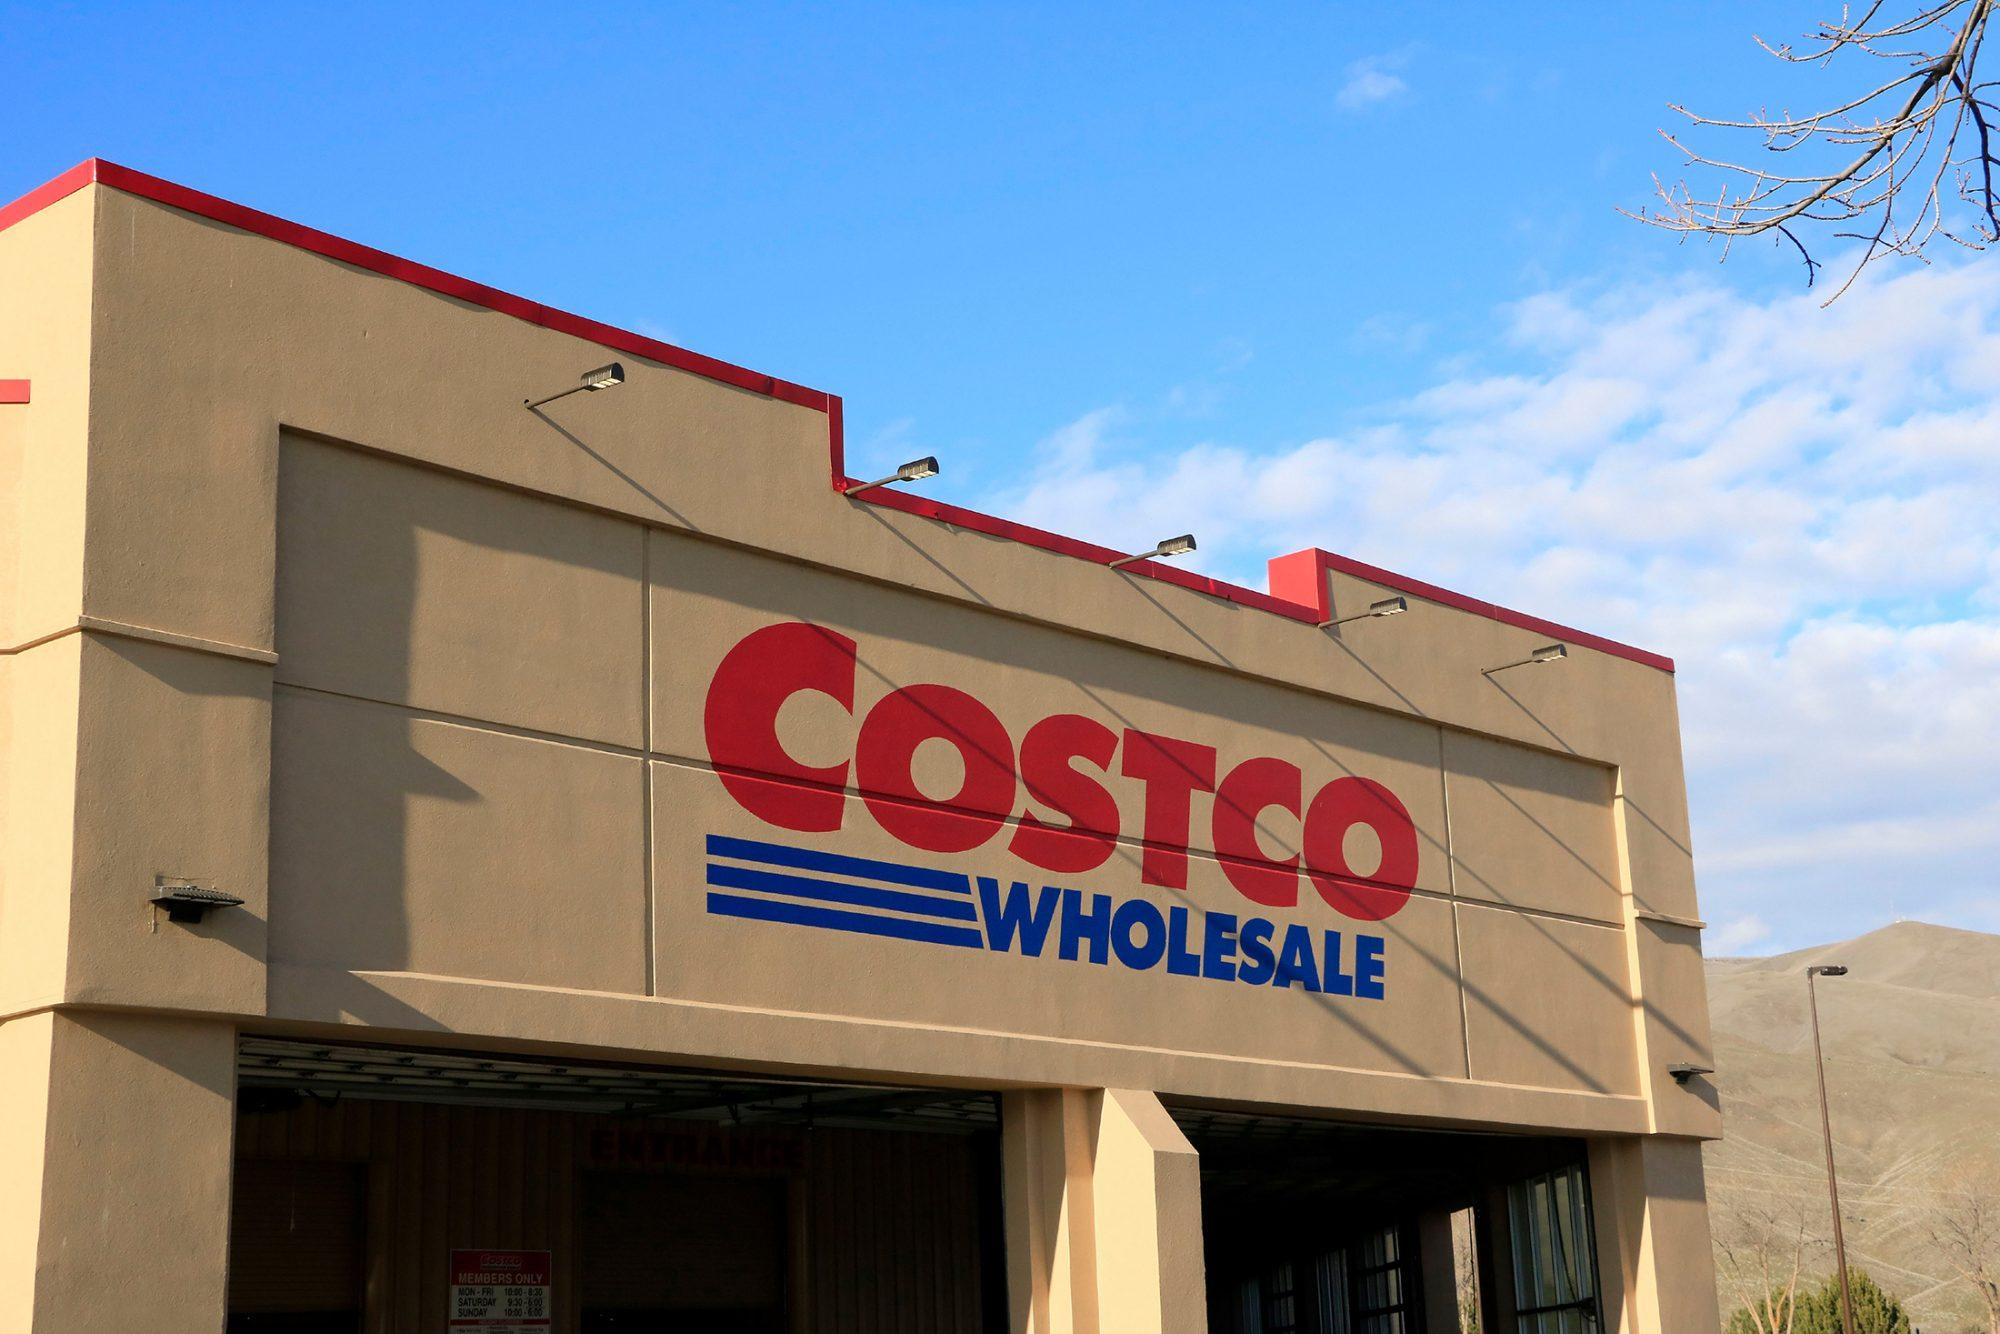 costco-store-1225590817.jpg